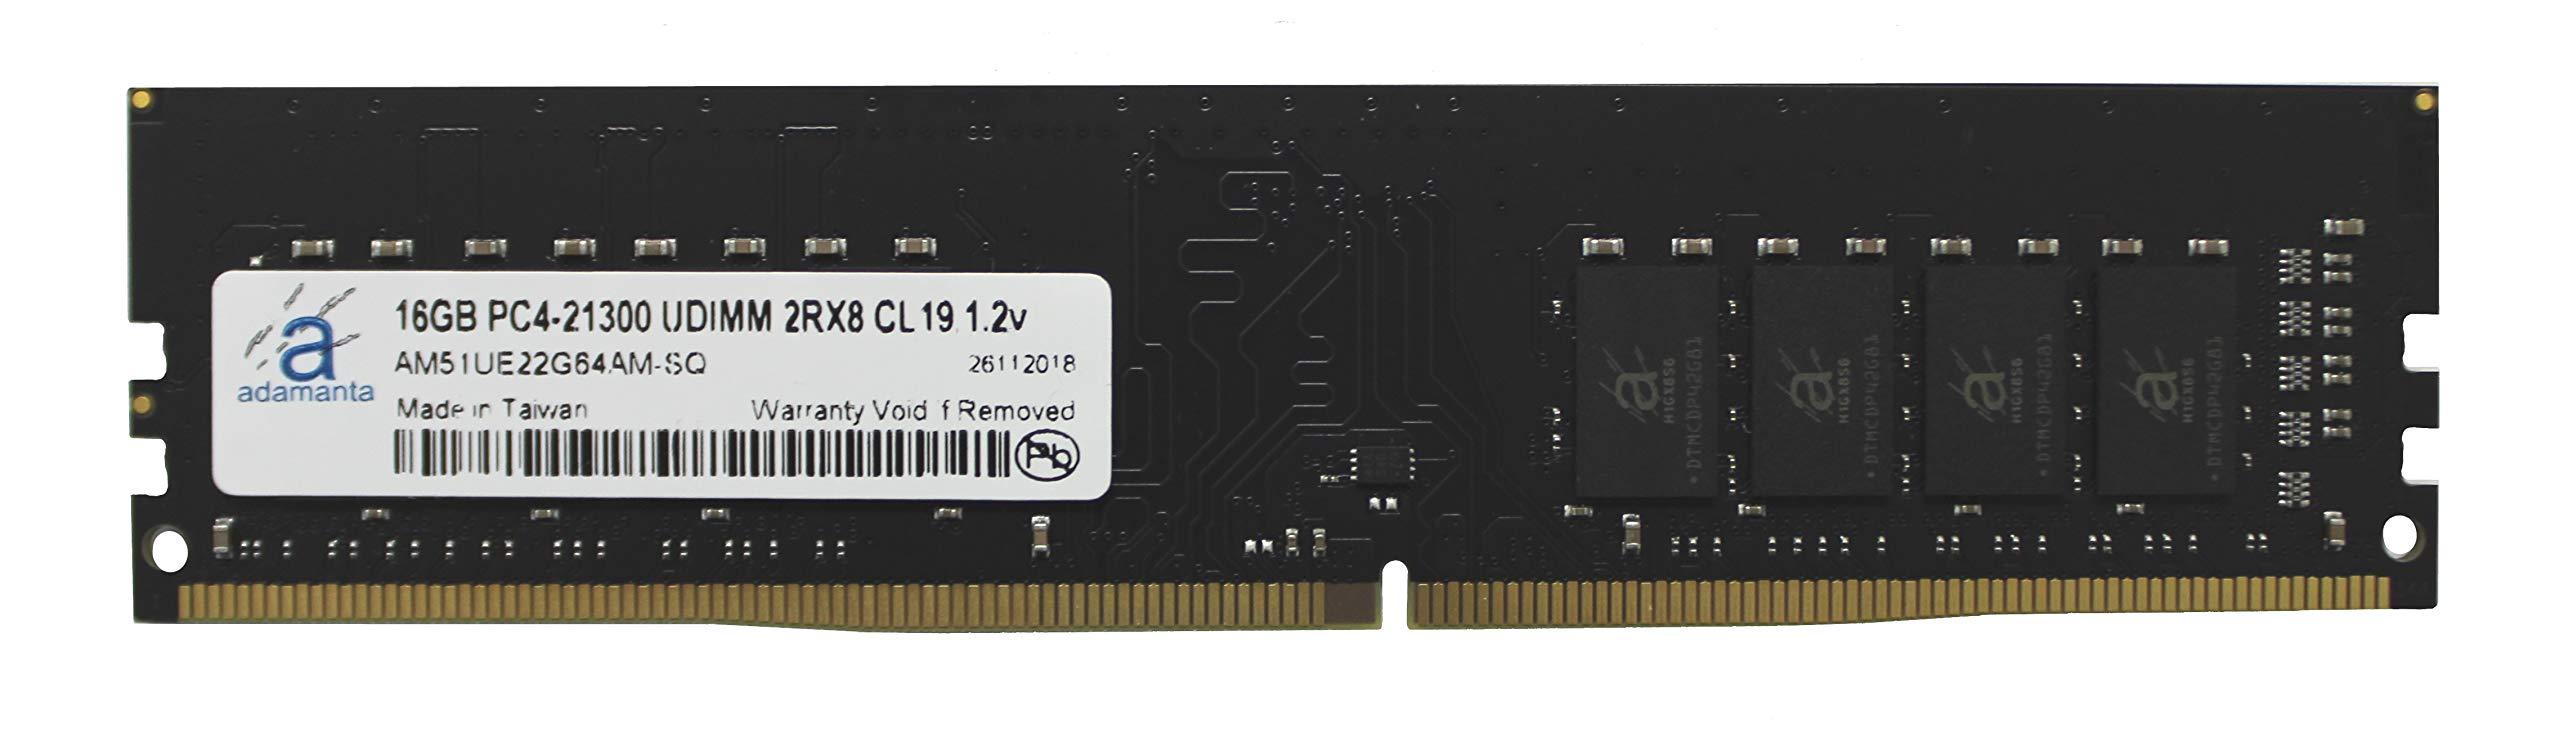 Memoria RAM 16GB Adamanta (1x16GB) Upgrade DDR4 2666Mhz PC4-21300 Unbuffered Non-ECC UDIMM 2Rx8 CL19 1.2v DRAM RAM